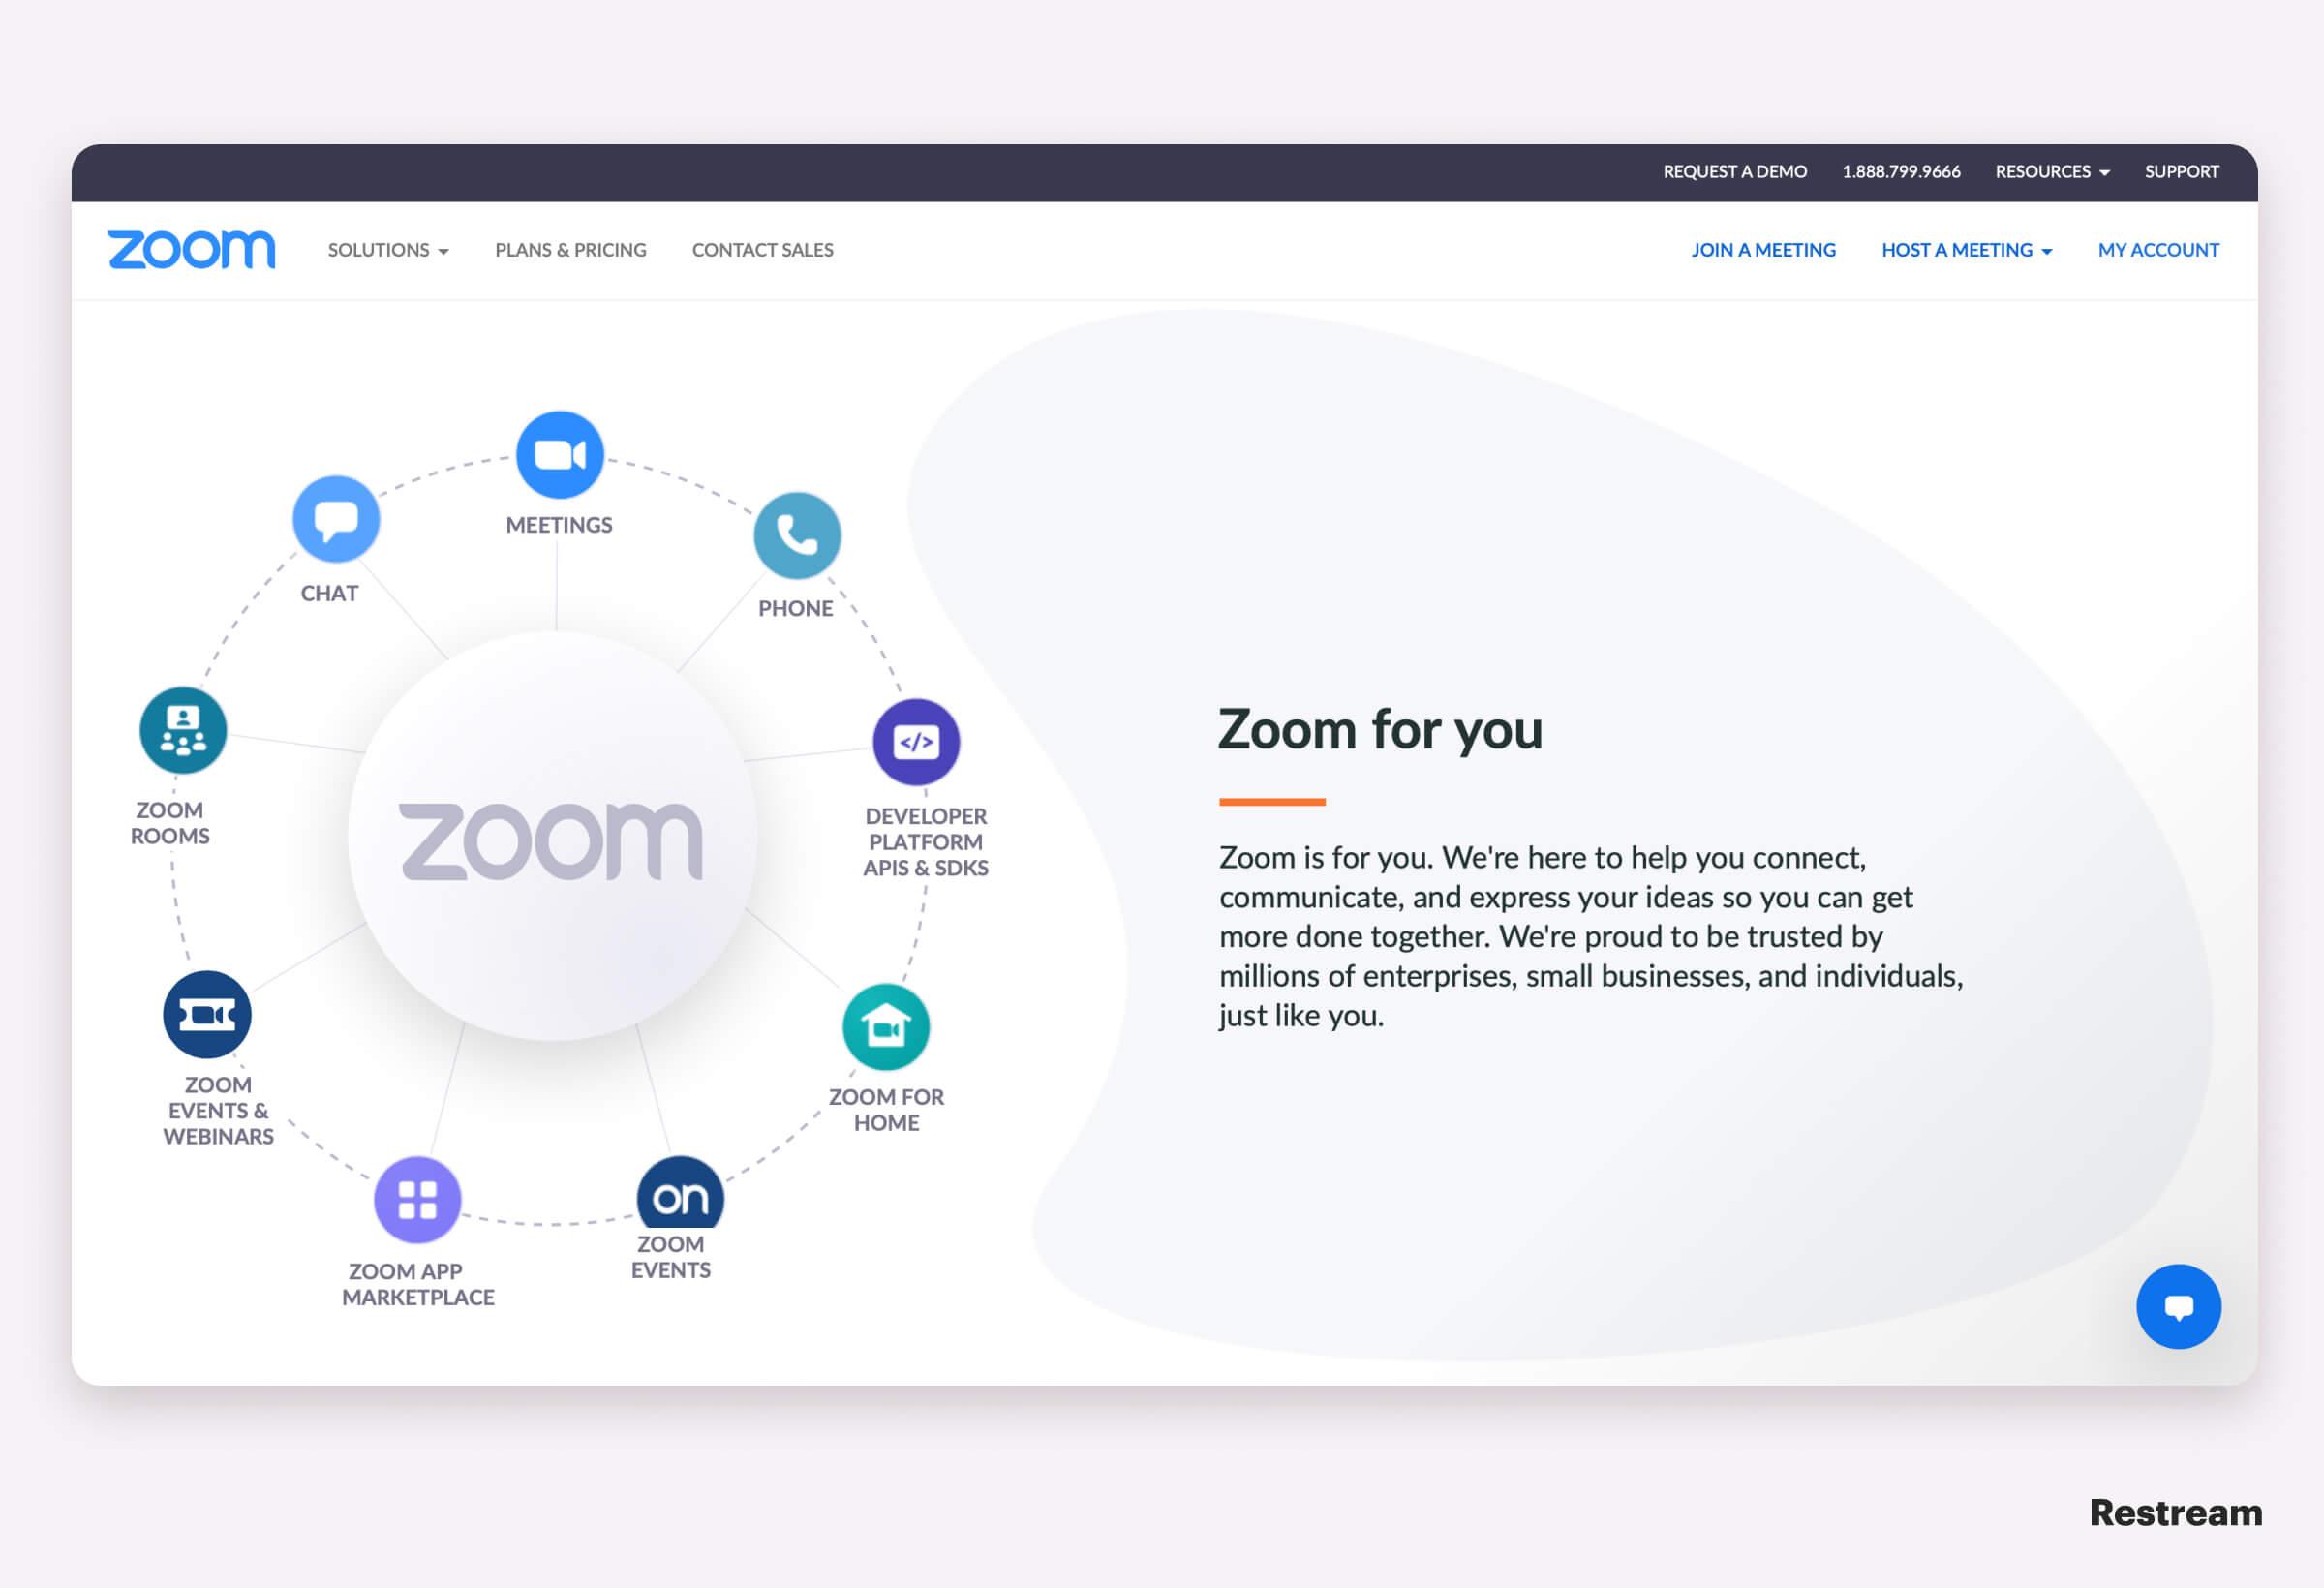 How to live stream Zoom webinars and meetings